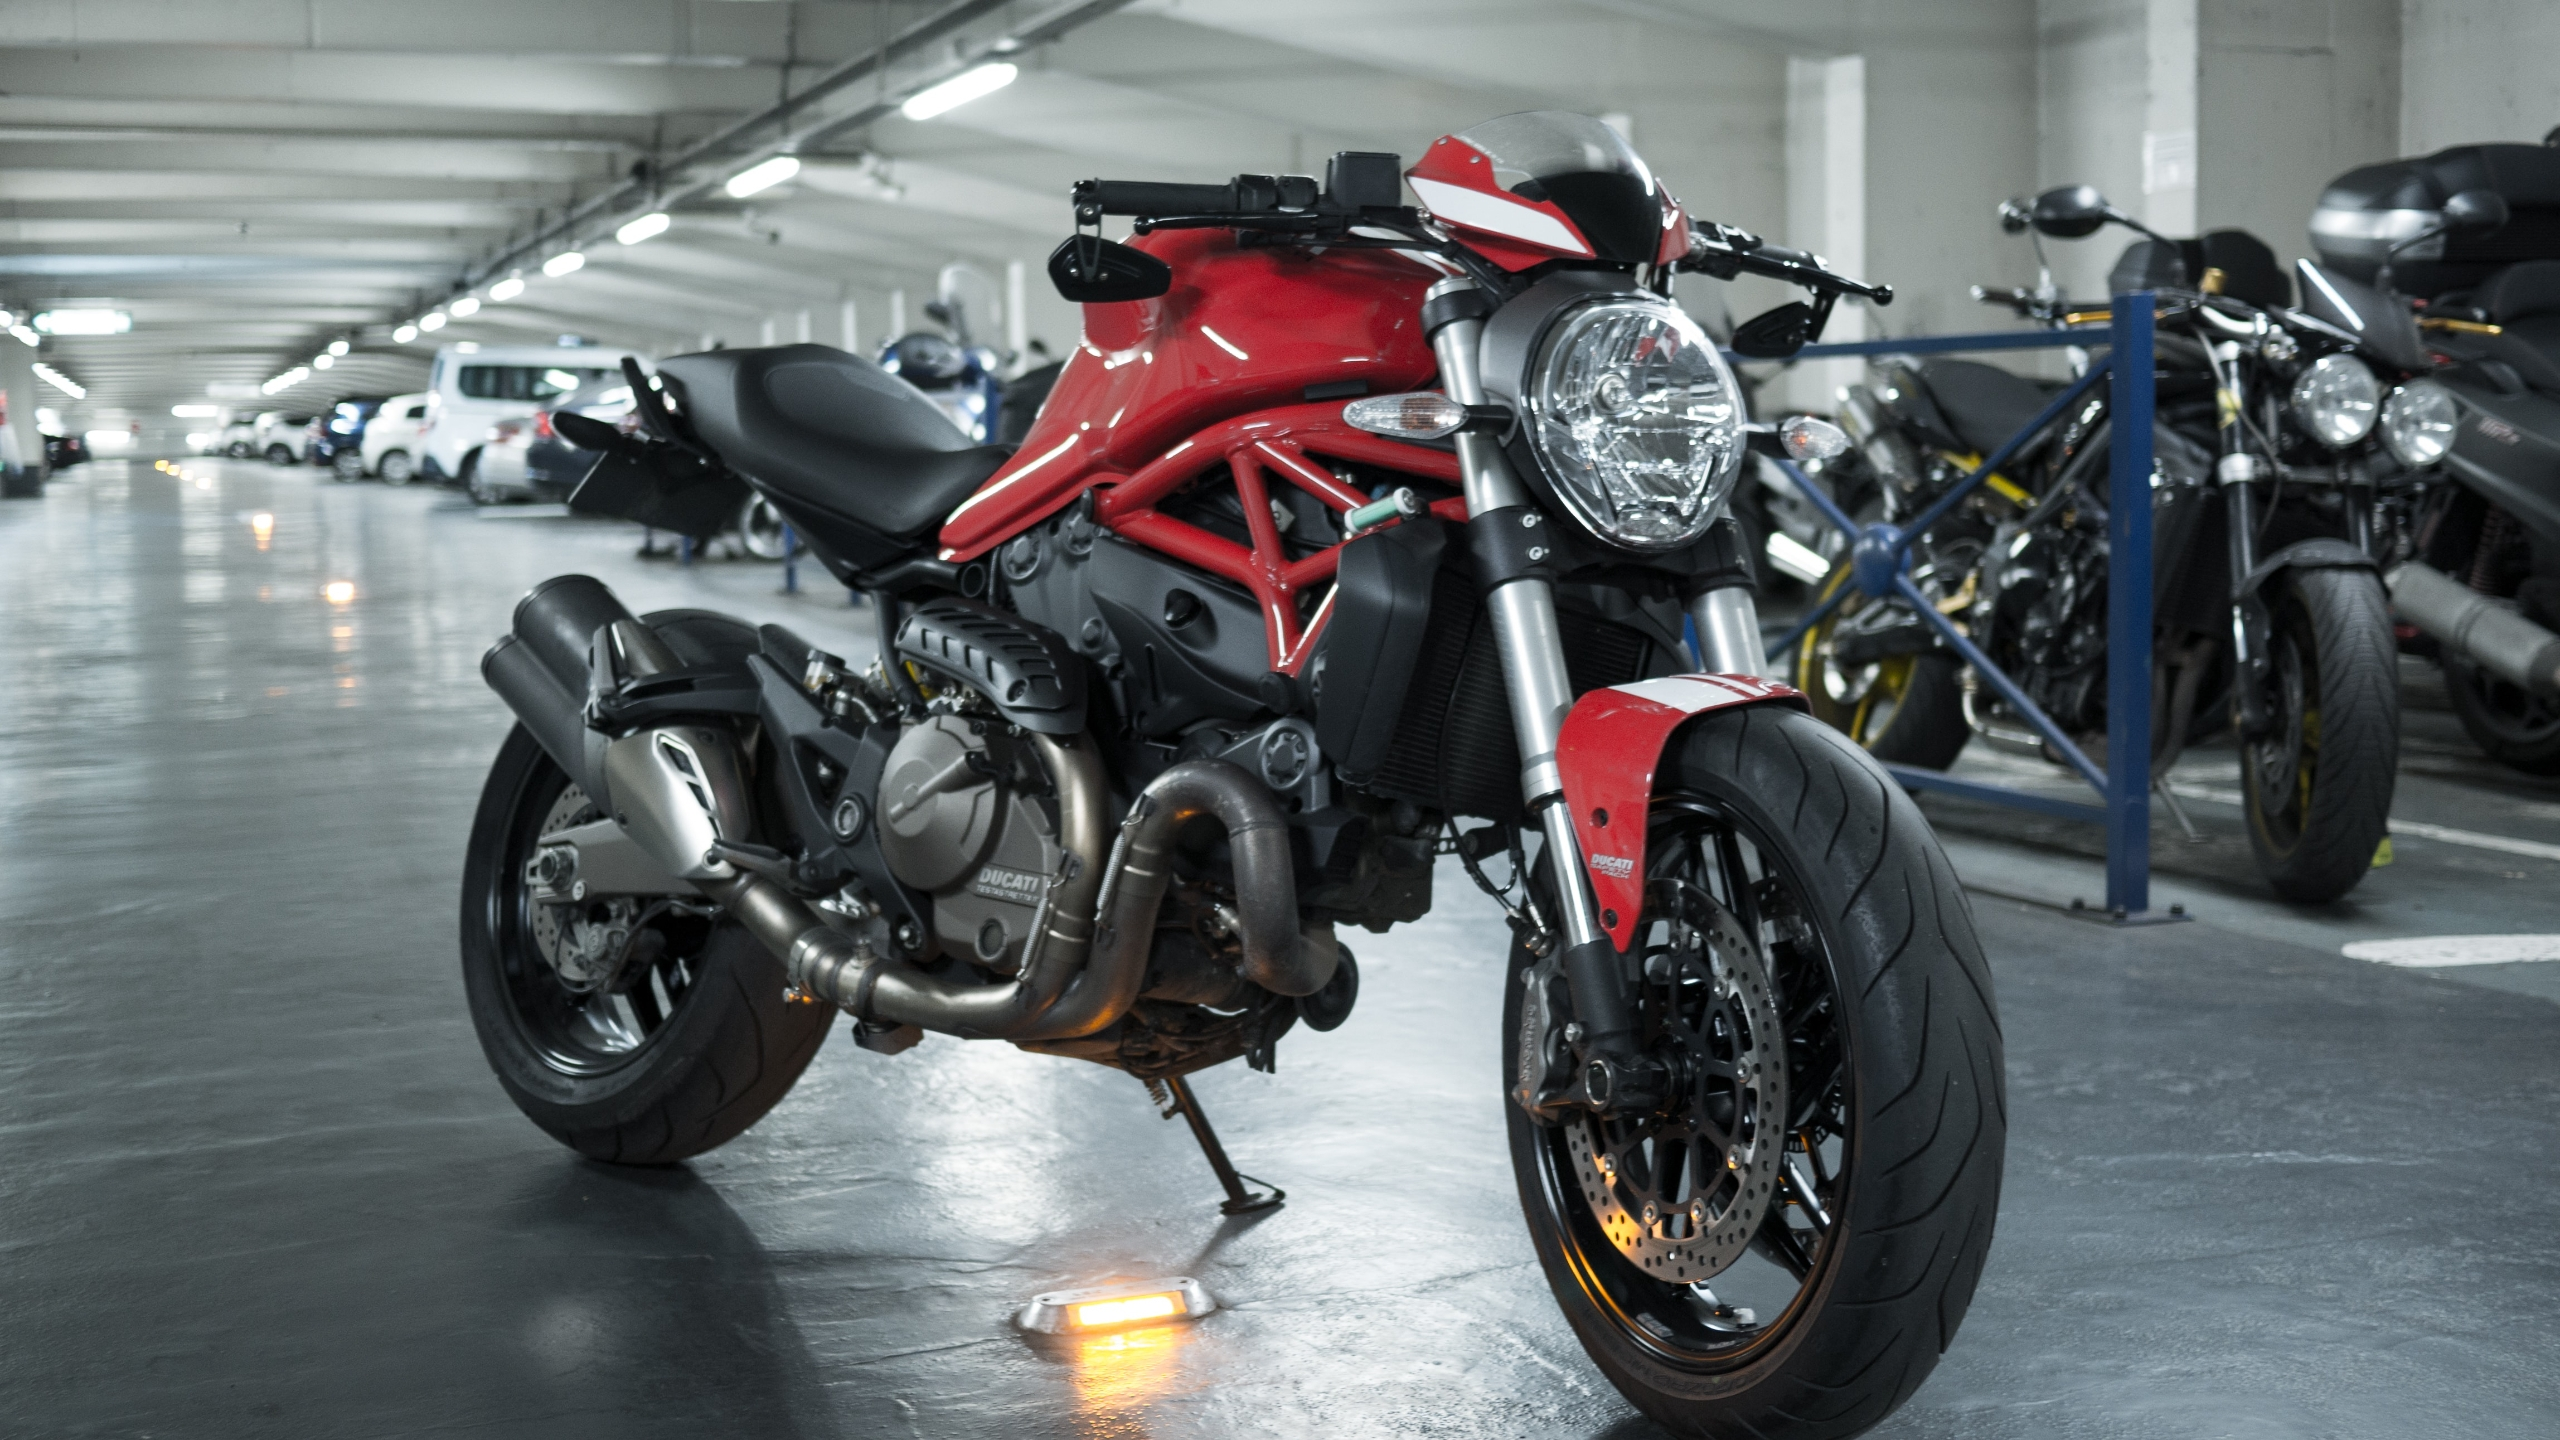 Ducati Cafe Racer - caferacerdesign | ello